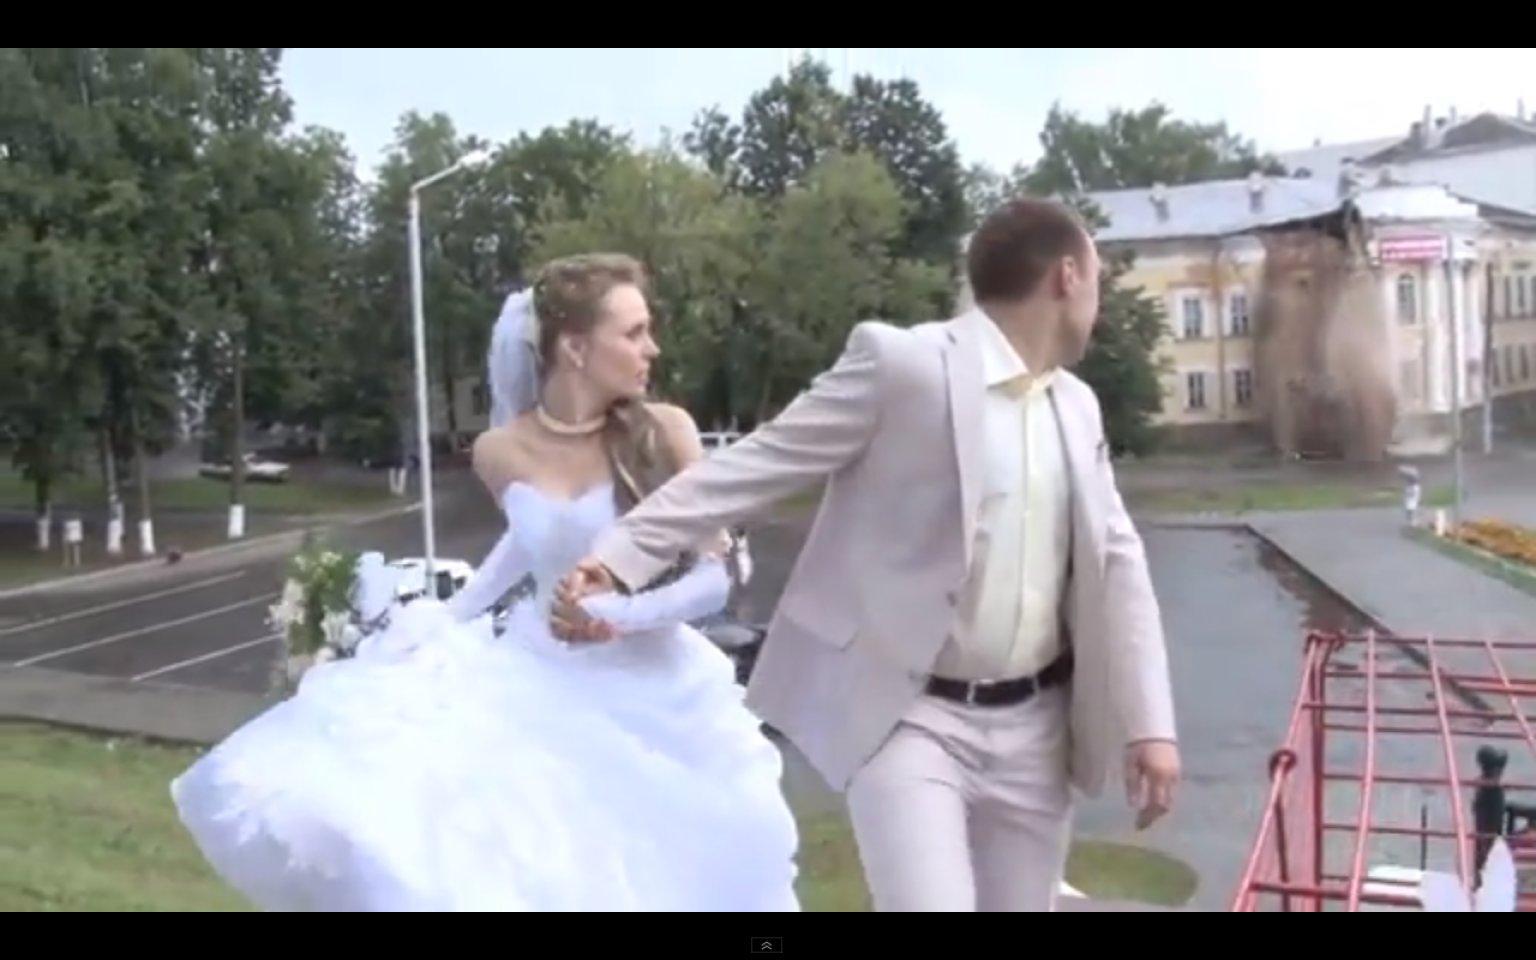 Russian Wedding Building Collaps Video Bad Omen Lazer Horse